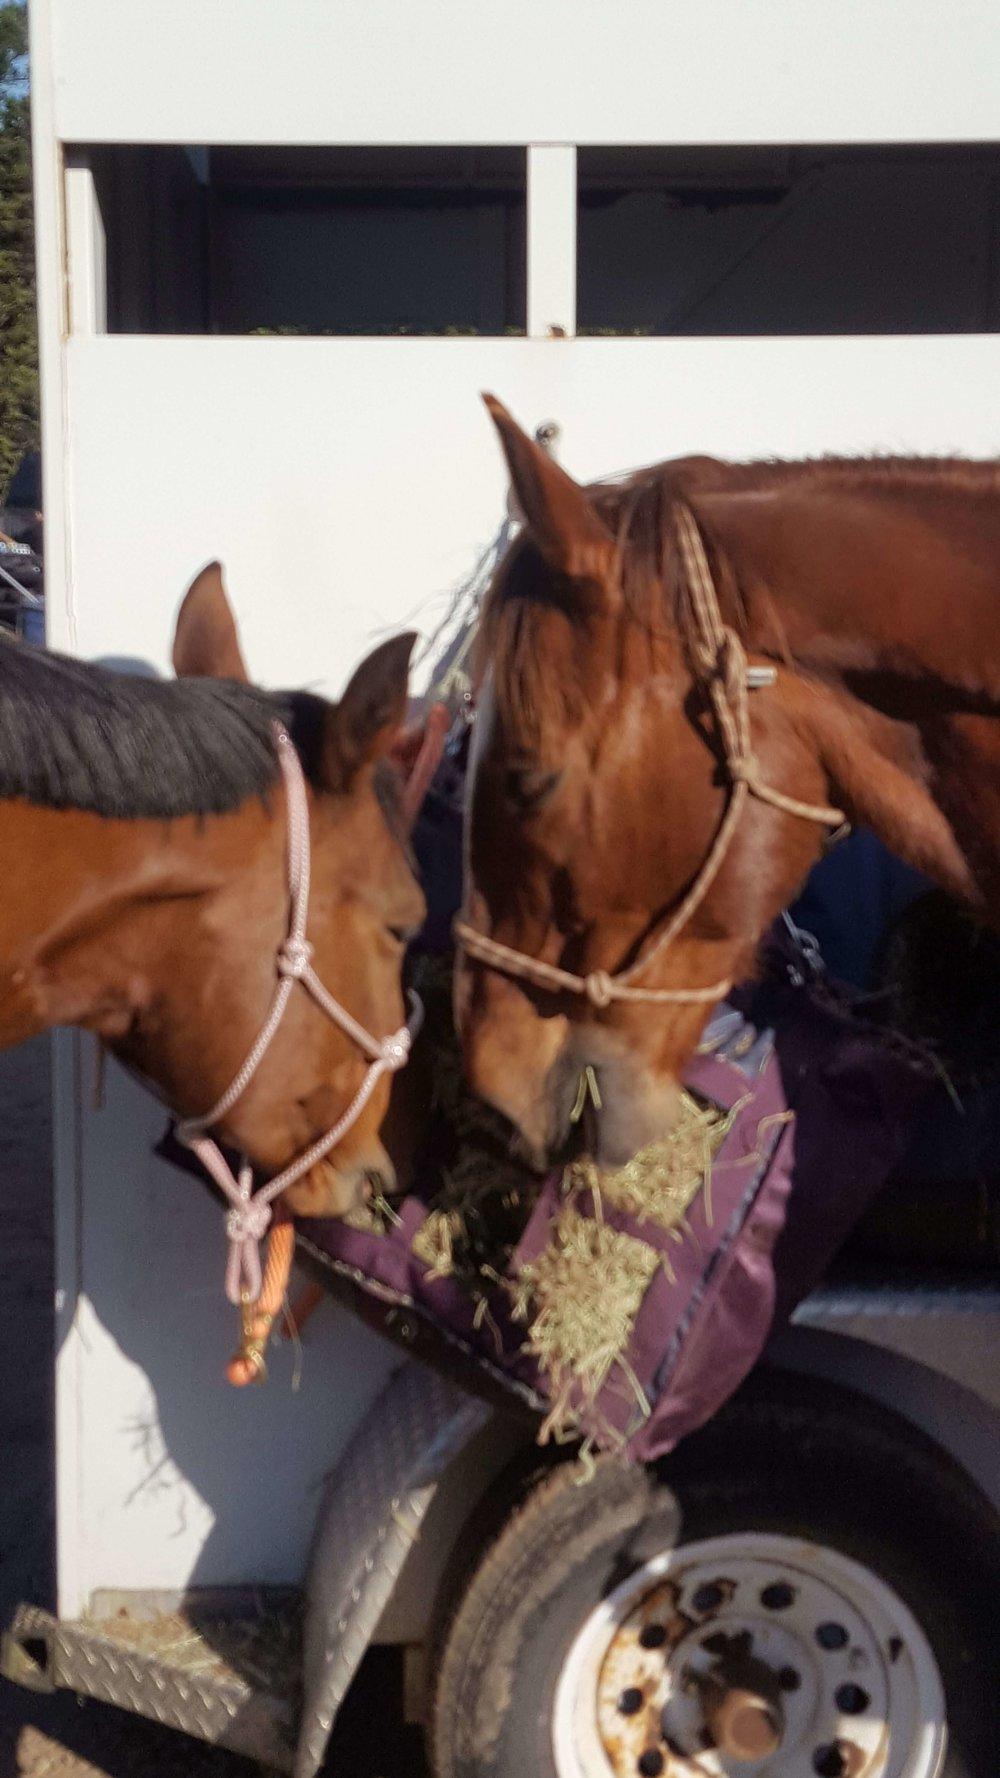 Horses sharing